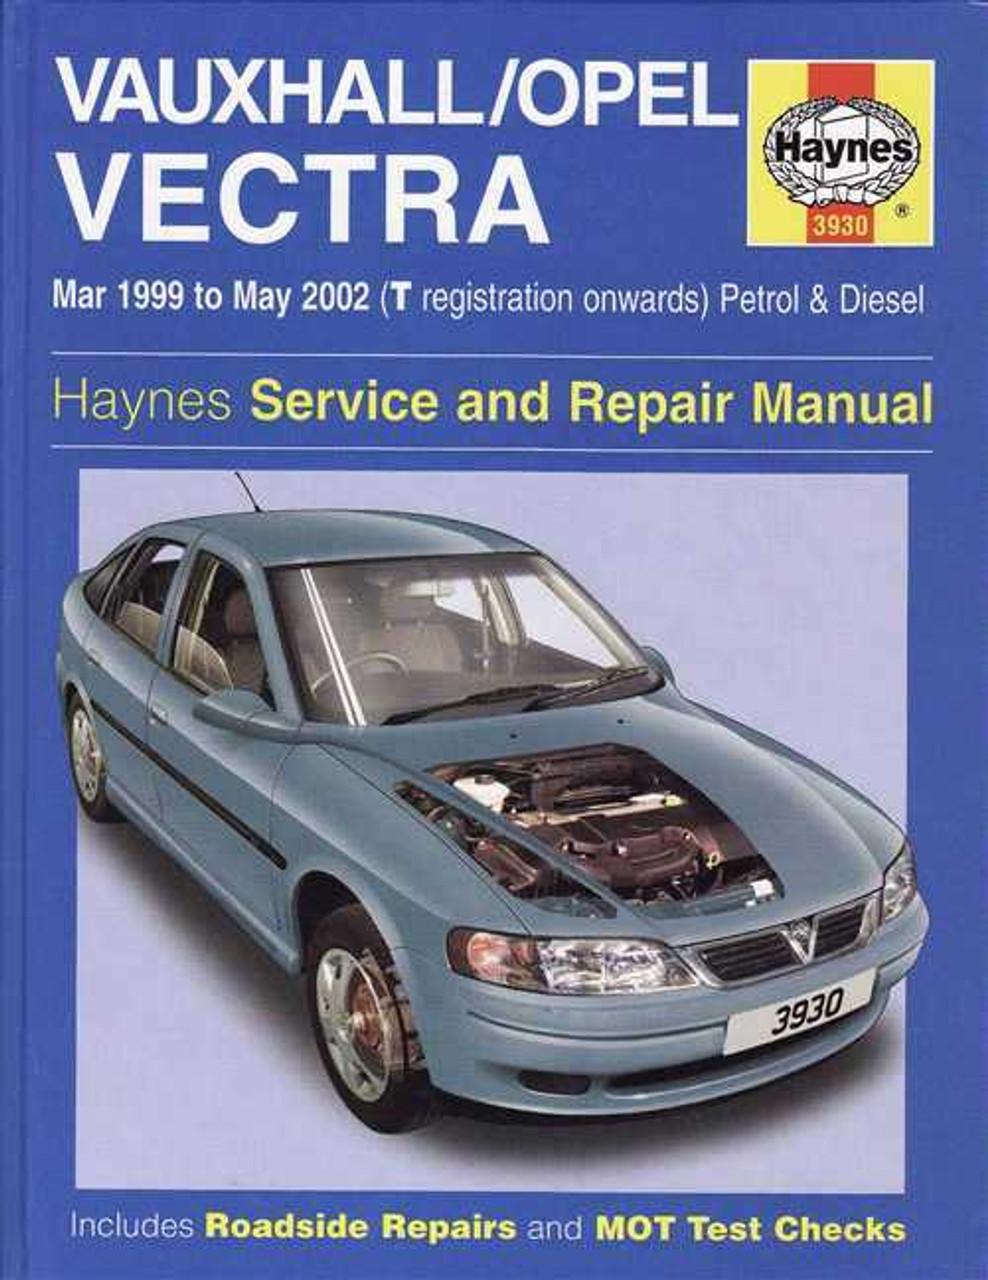 Holden vectra vauxhall opel 1999 2002 workshop manual fandeluxe Choice Image